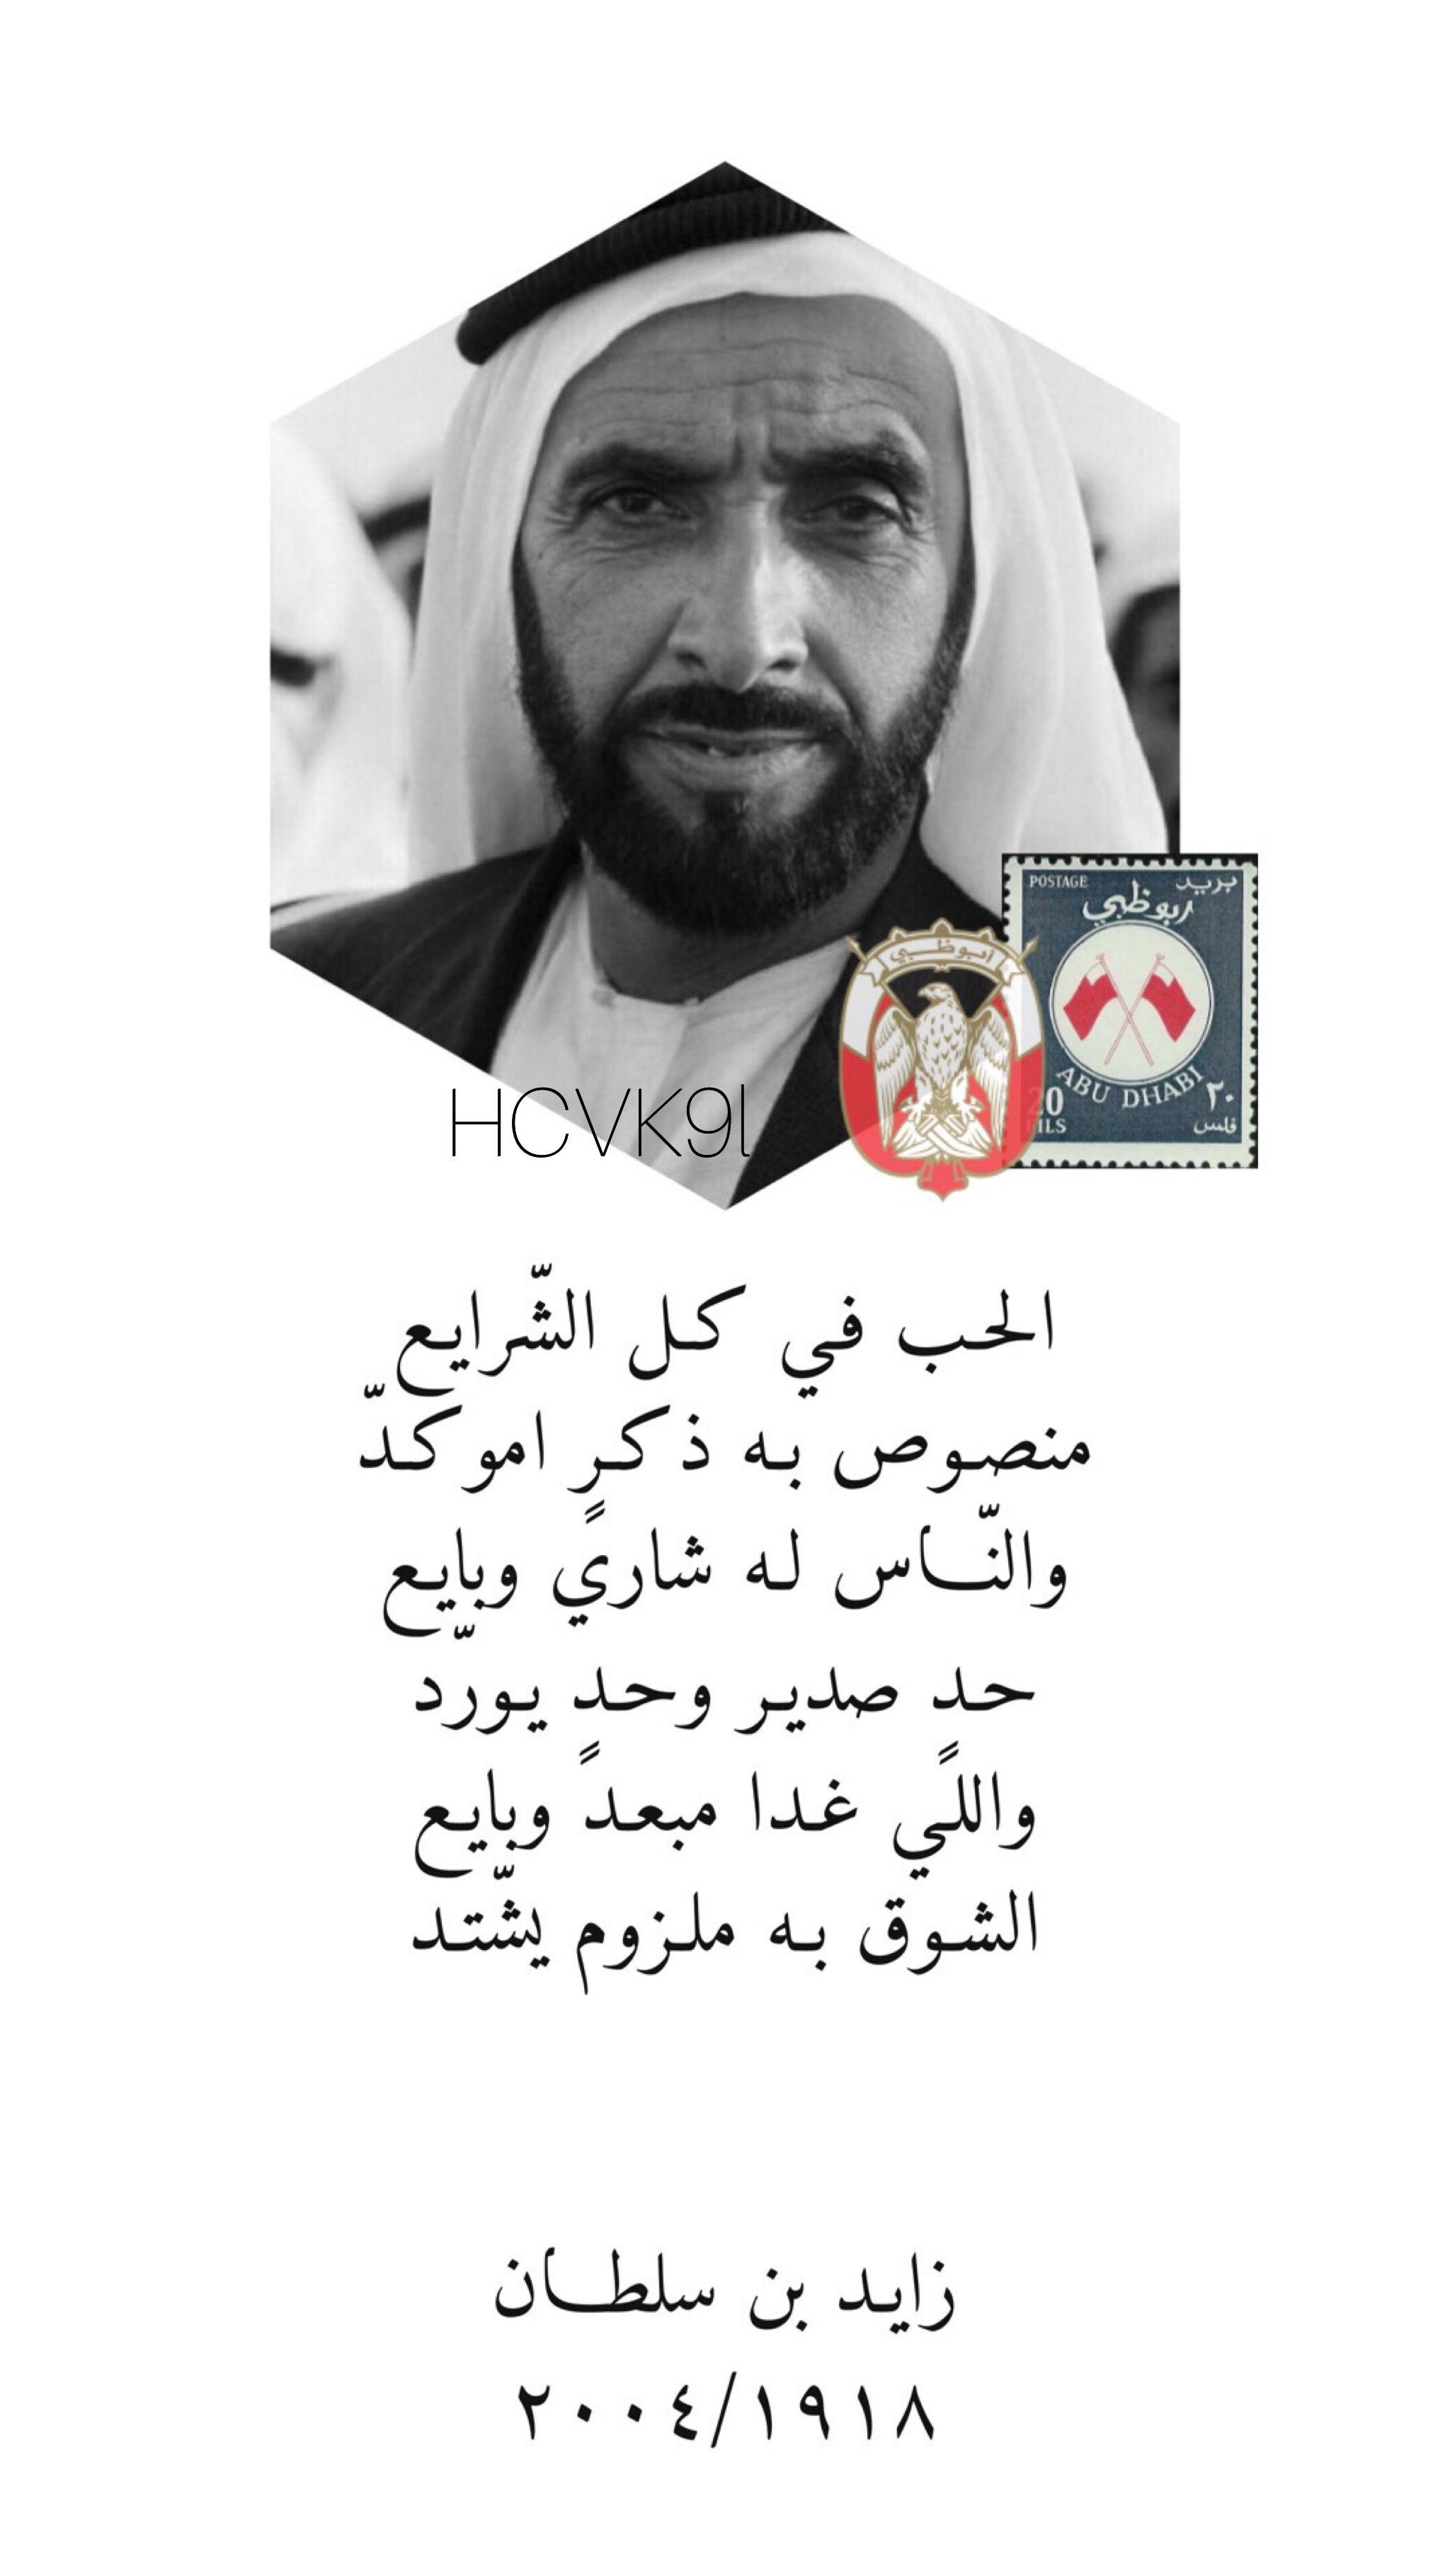 الشيخ زايد بن سلطان Beautiful Arabic Words Start Quotes Funny Arabic Quotes